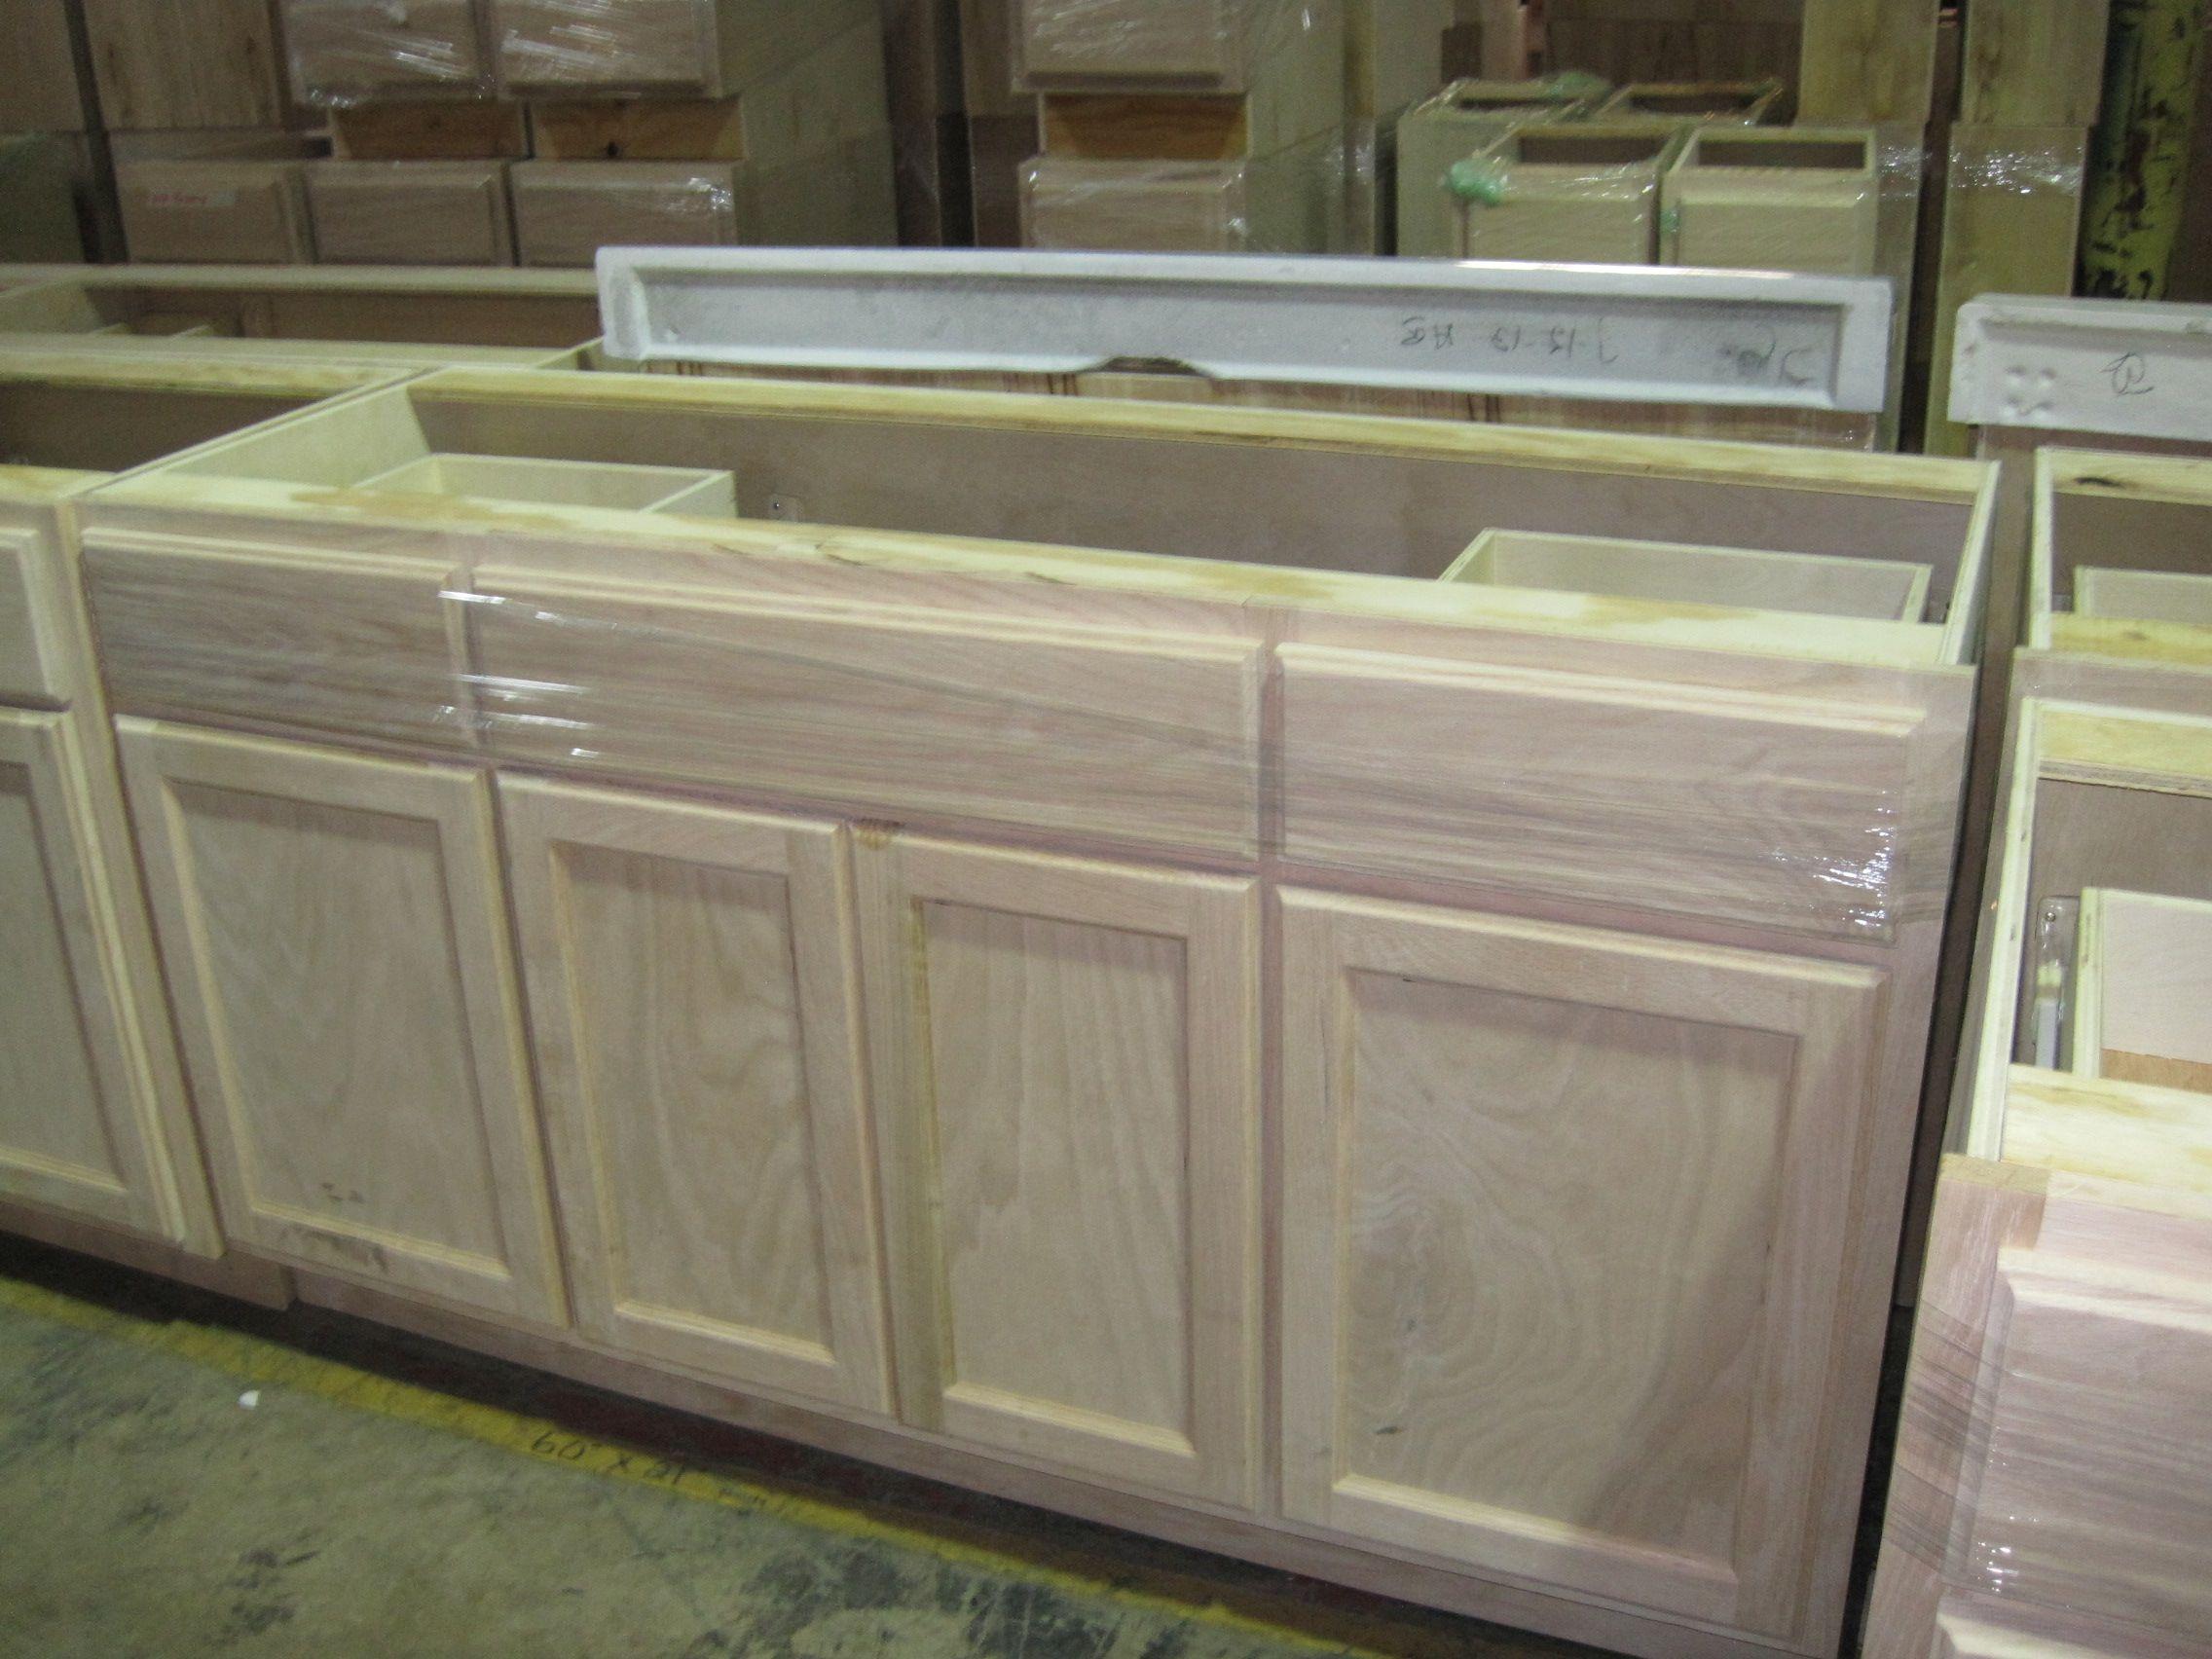 Wholesale Kitchen Cabinets Ga 72 Inch Oak Sink Base Kitchen Cabinets For Sale Wholesale Kitchen Cabinets Unfinished Kitchen Cabinets